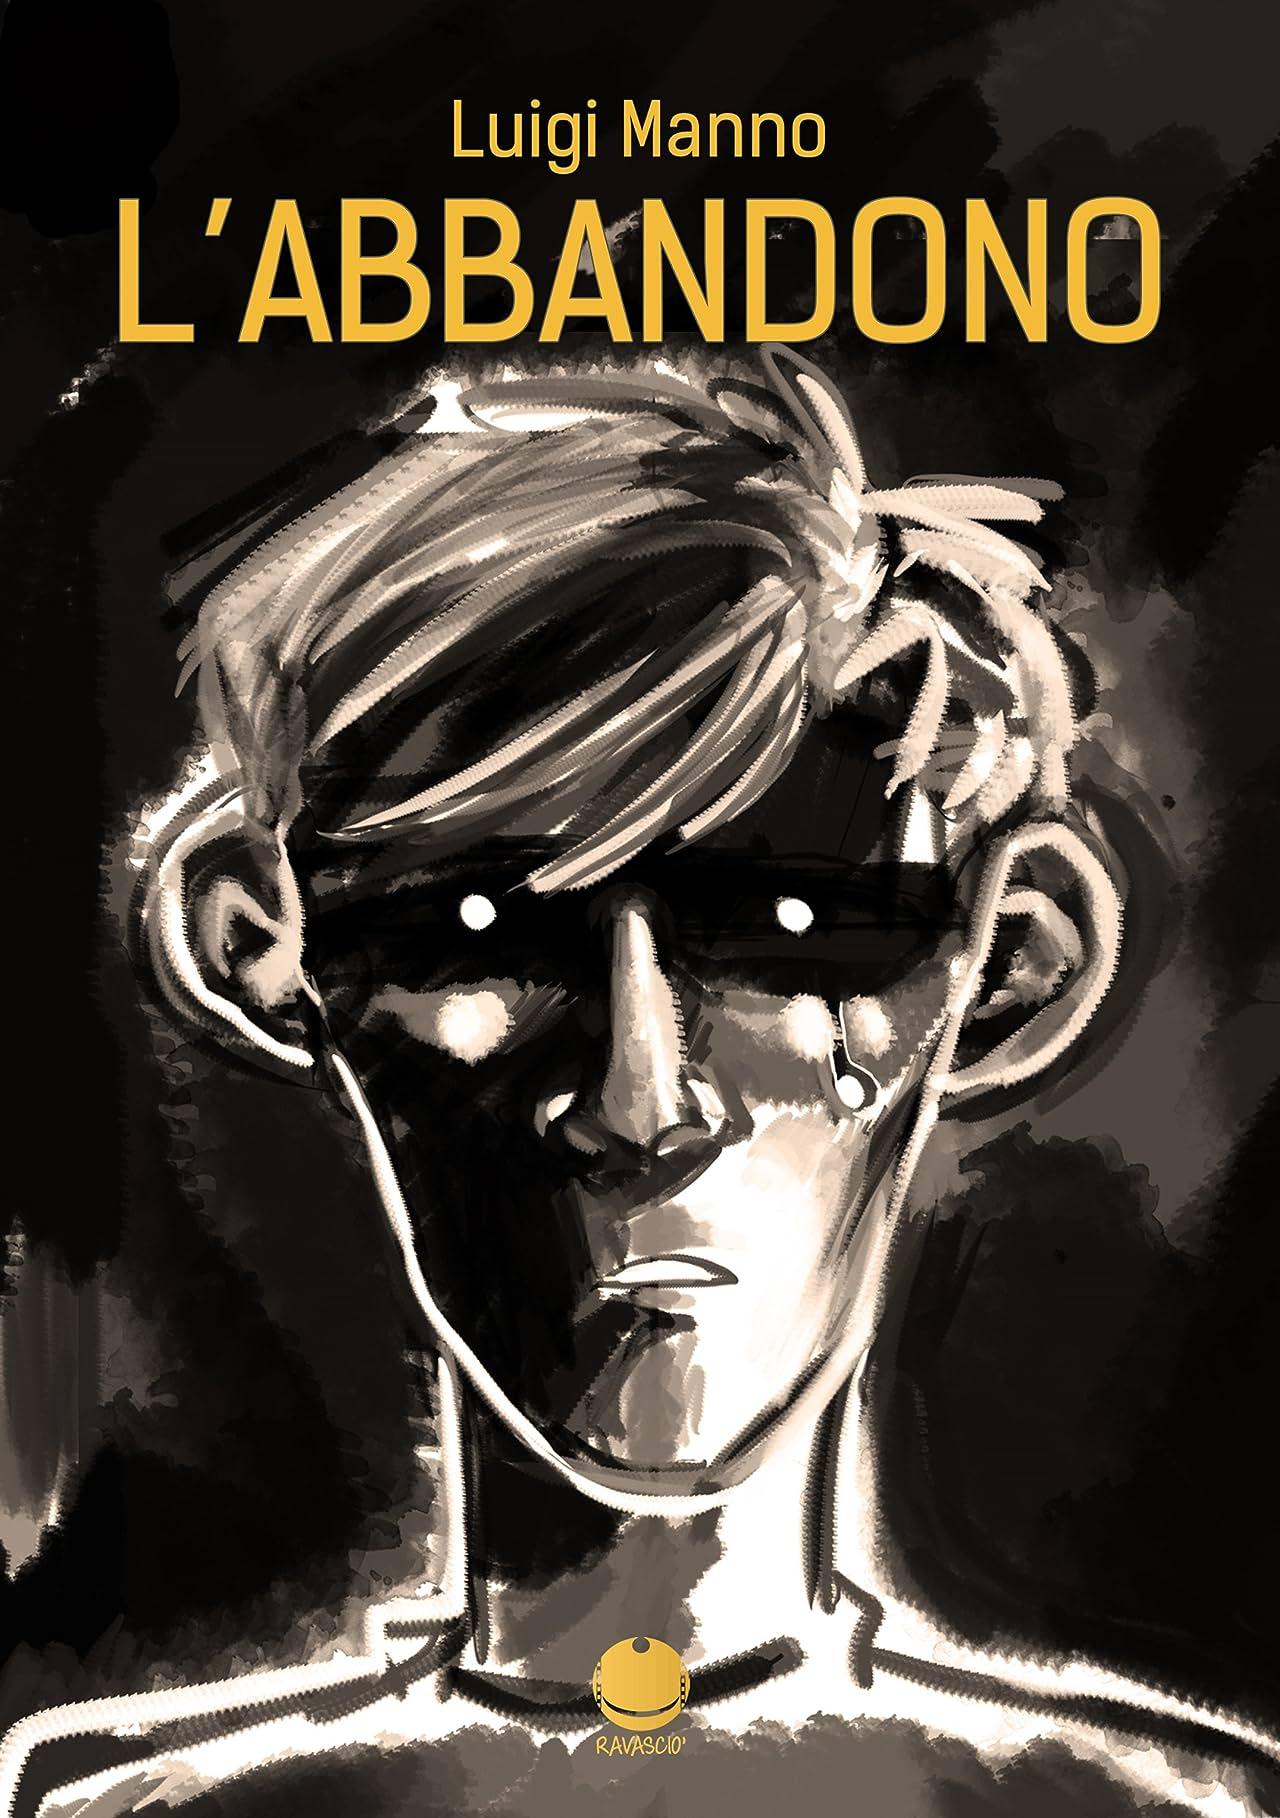 Ravasciò production - Fumetti italiani #1